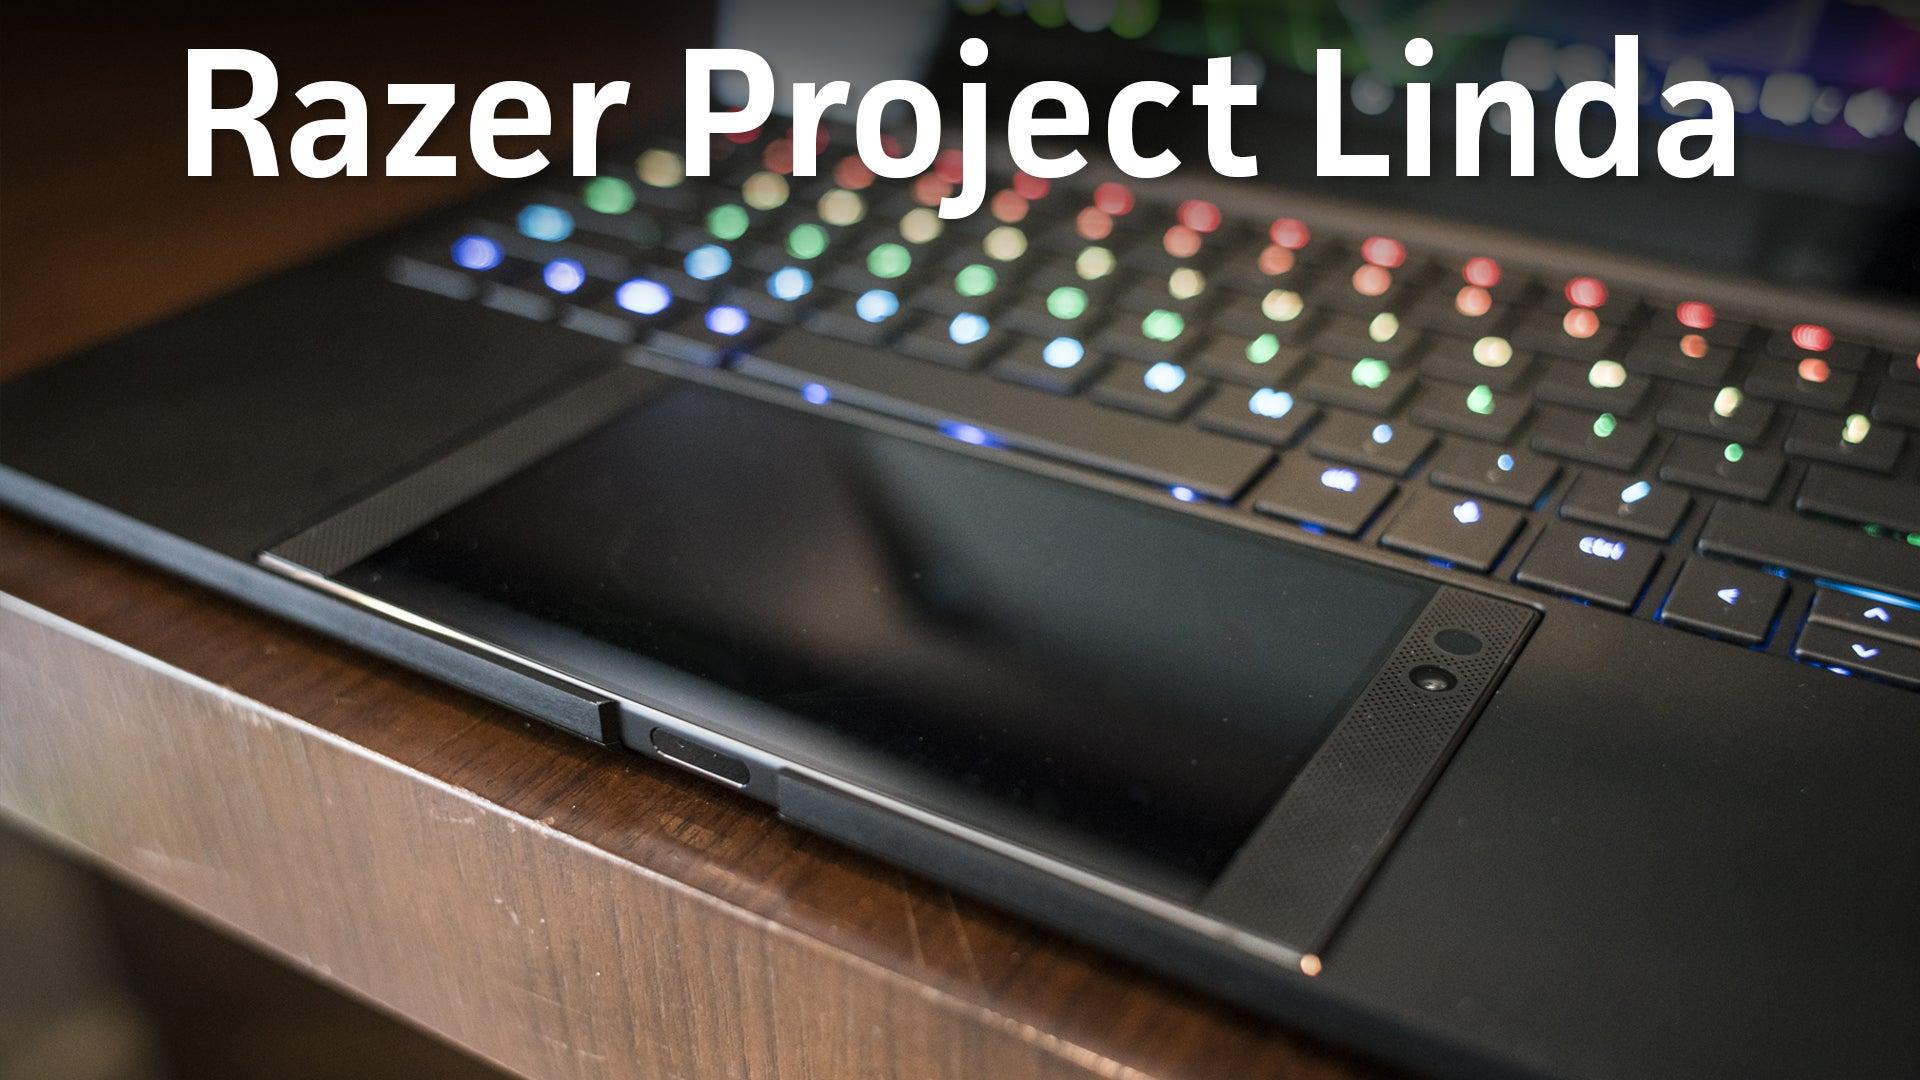 Razer Project Linda